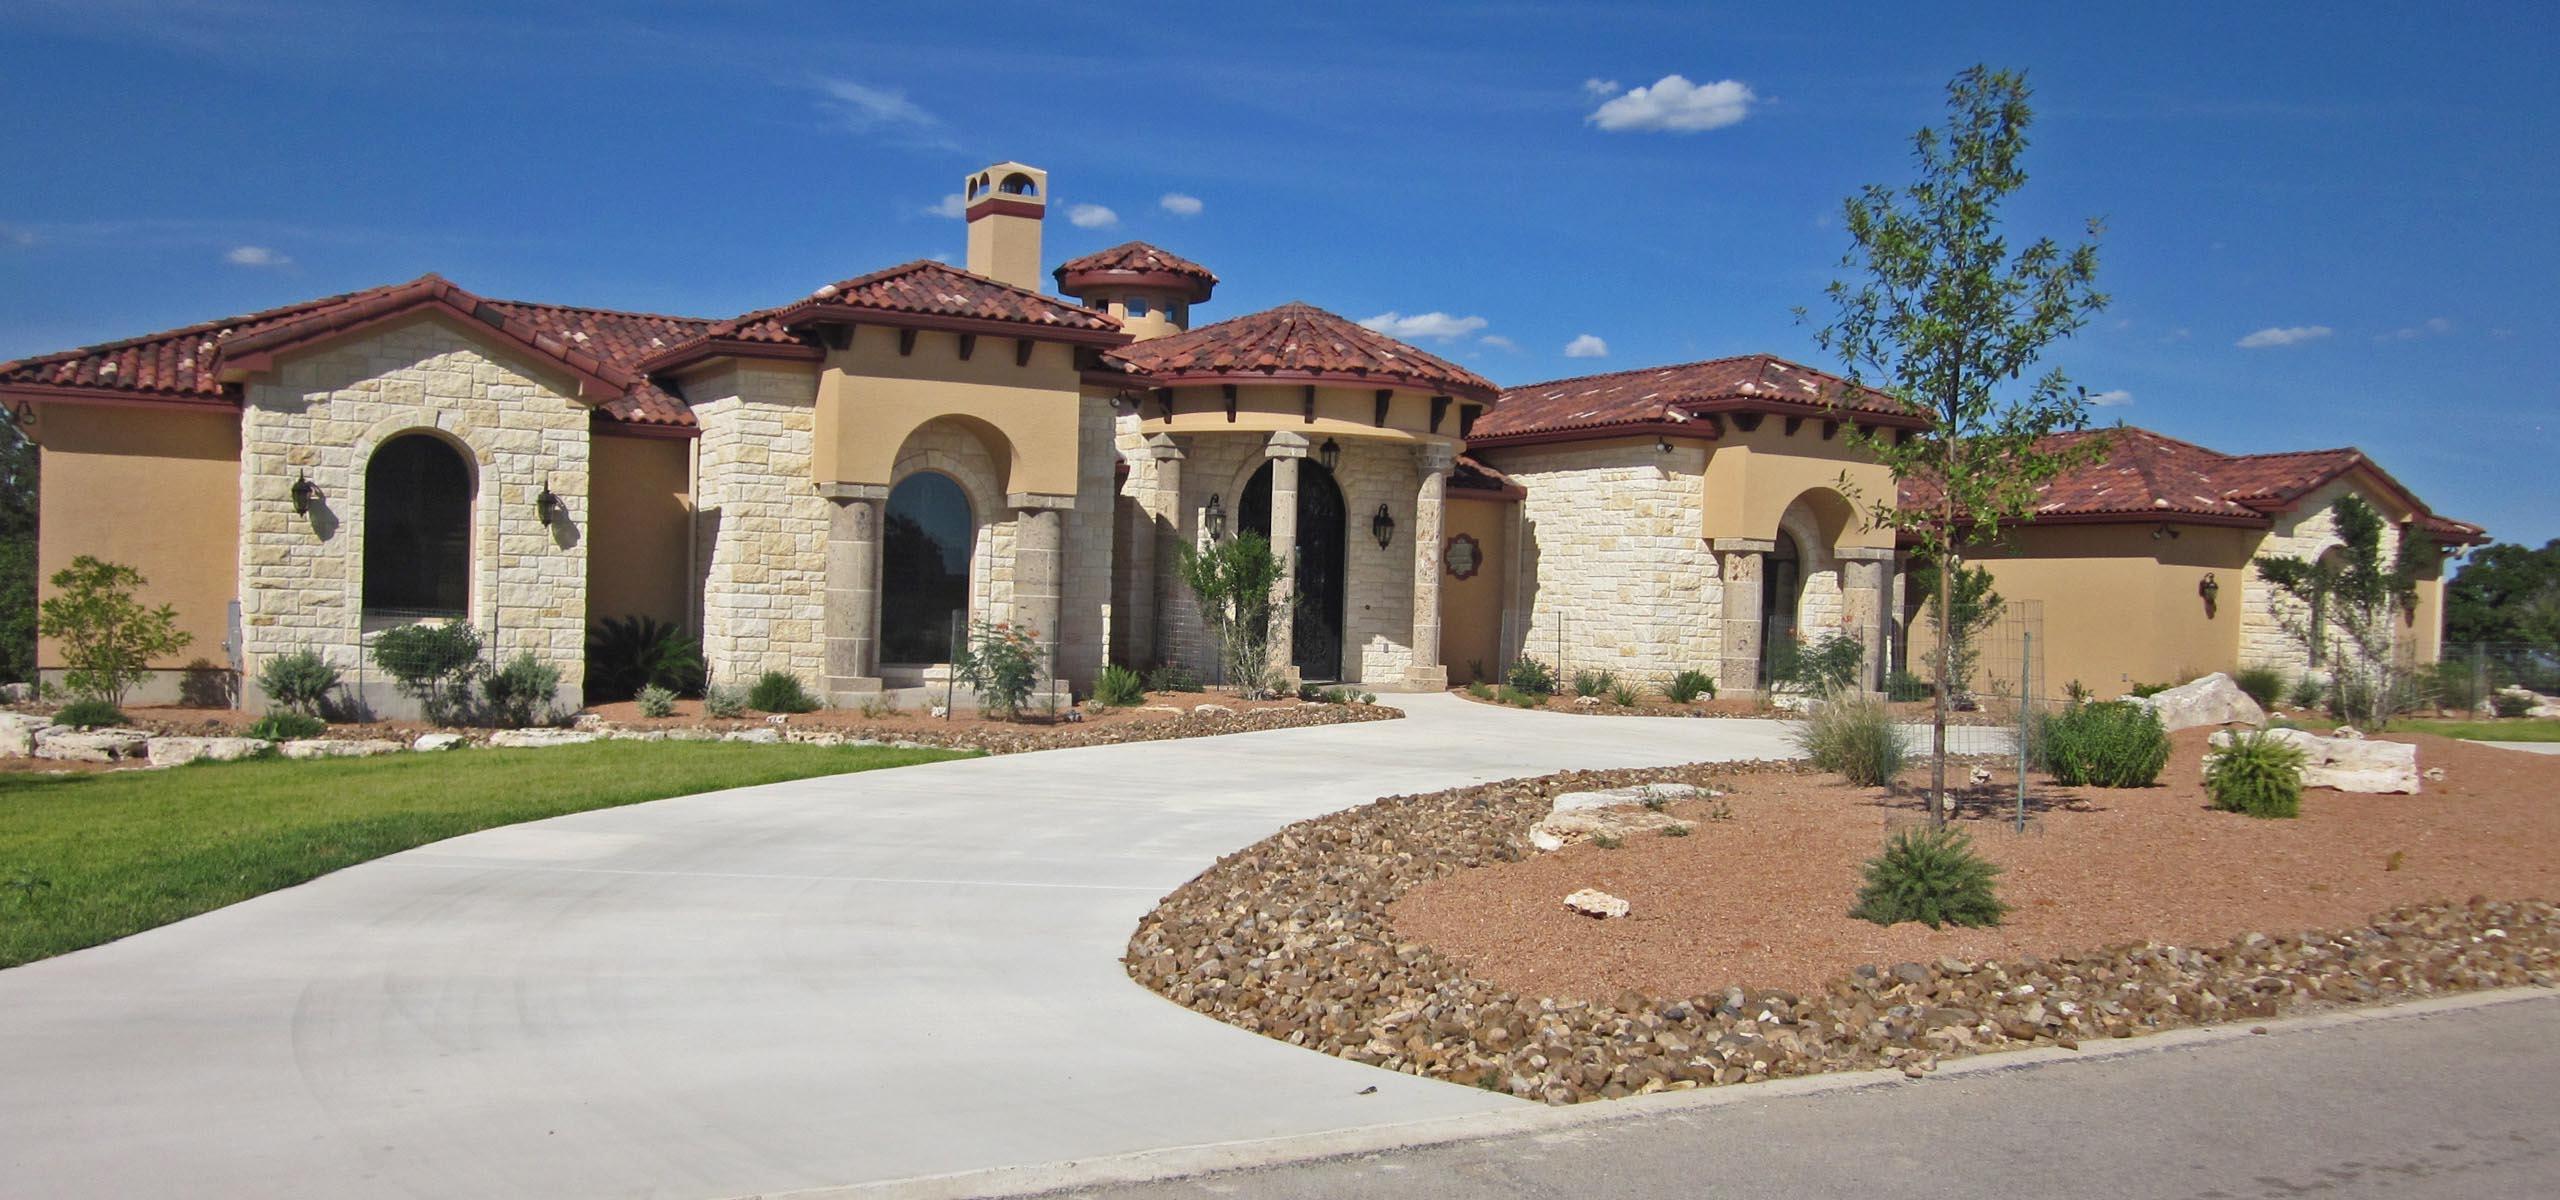 Parker house texas home plans for Parker house designs